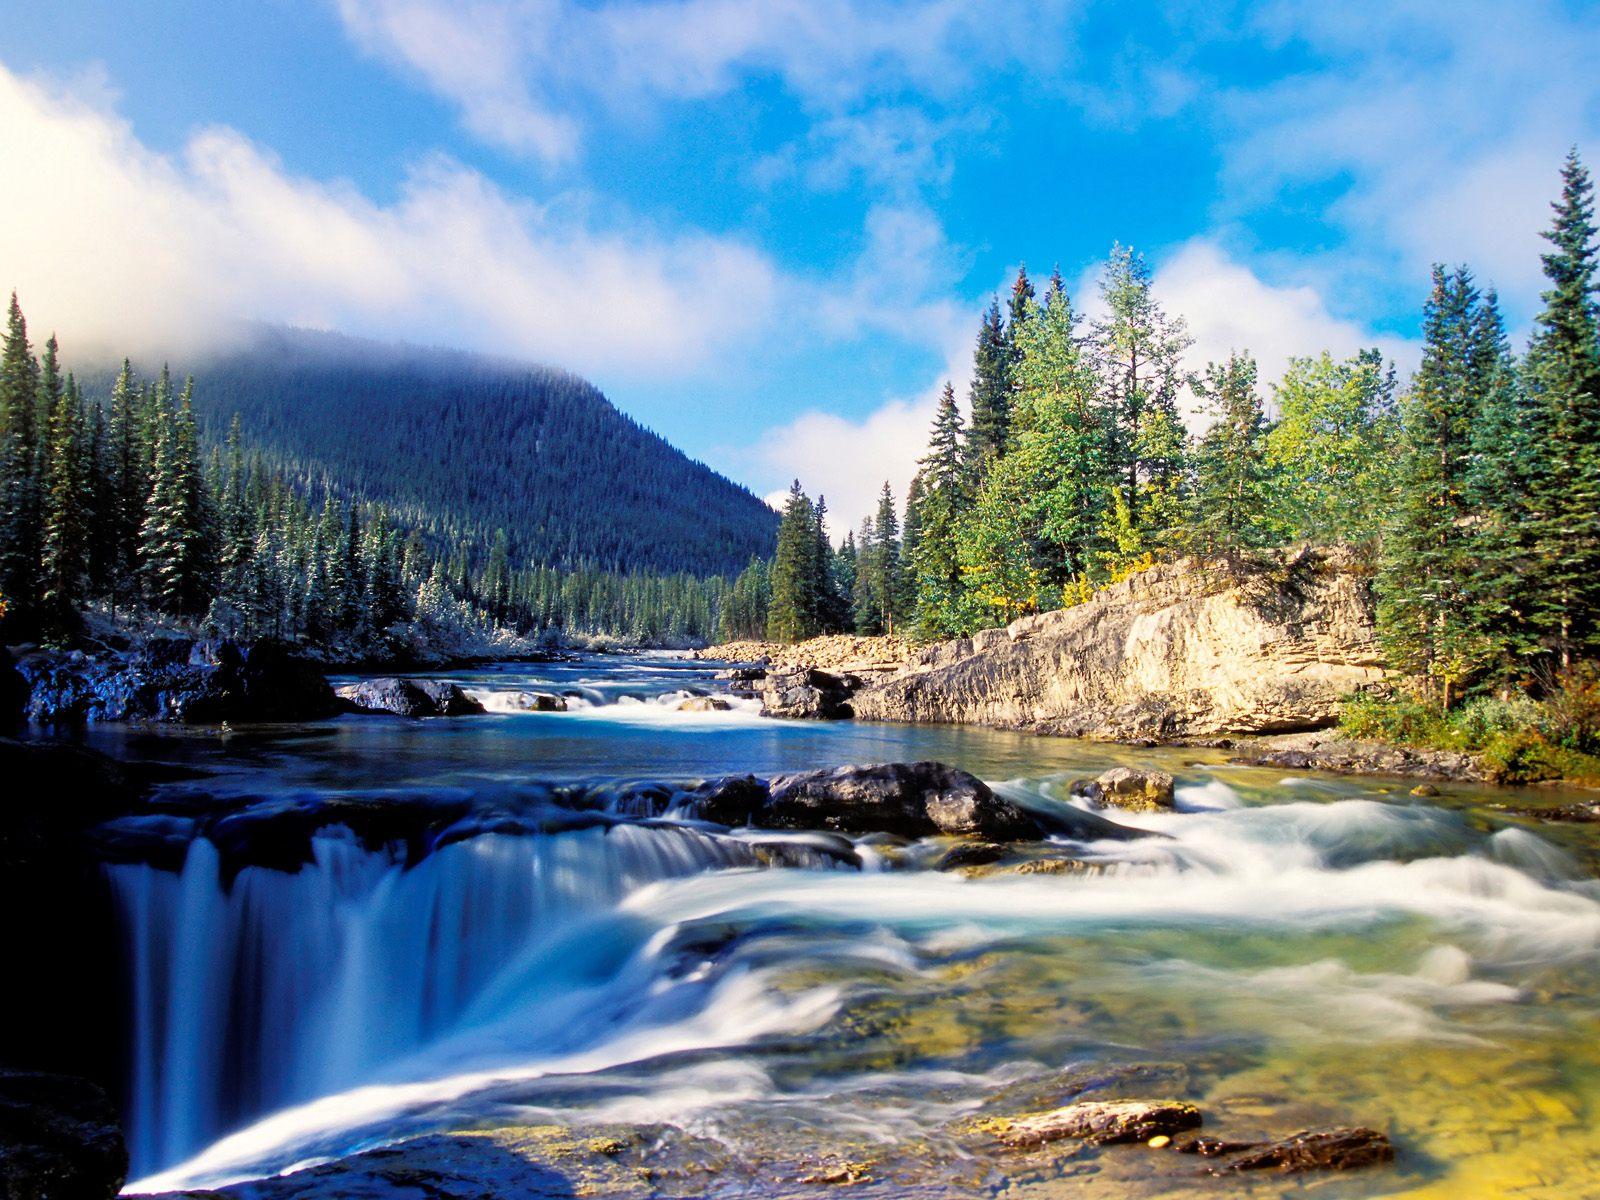 Falls Kananaskis Country Alberta Canada Wallpaper   HQ Wallpapers 1600x1200